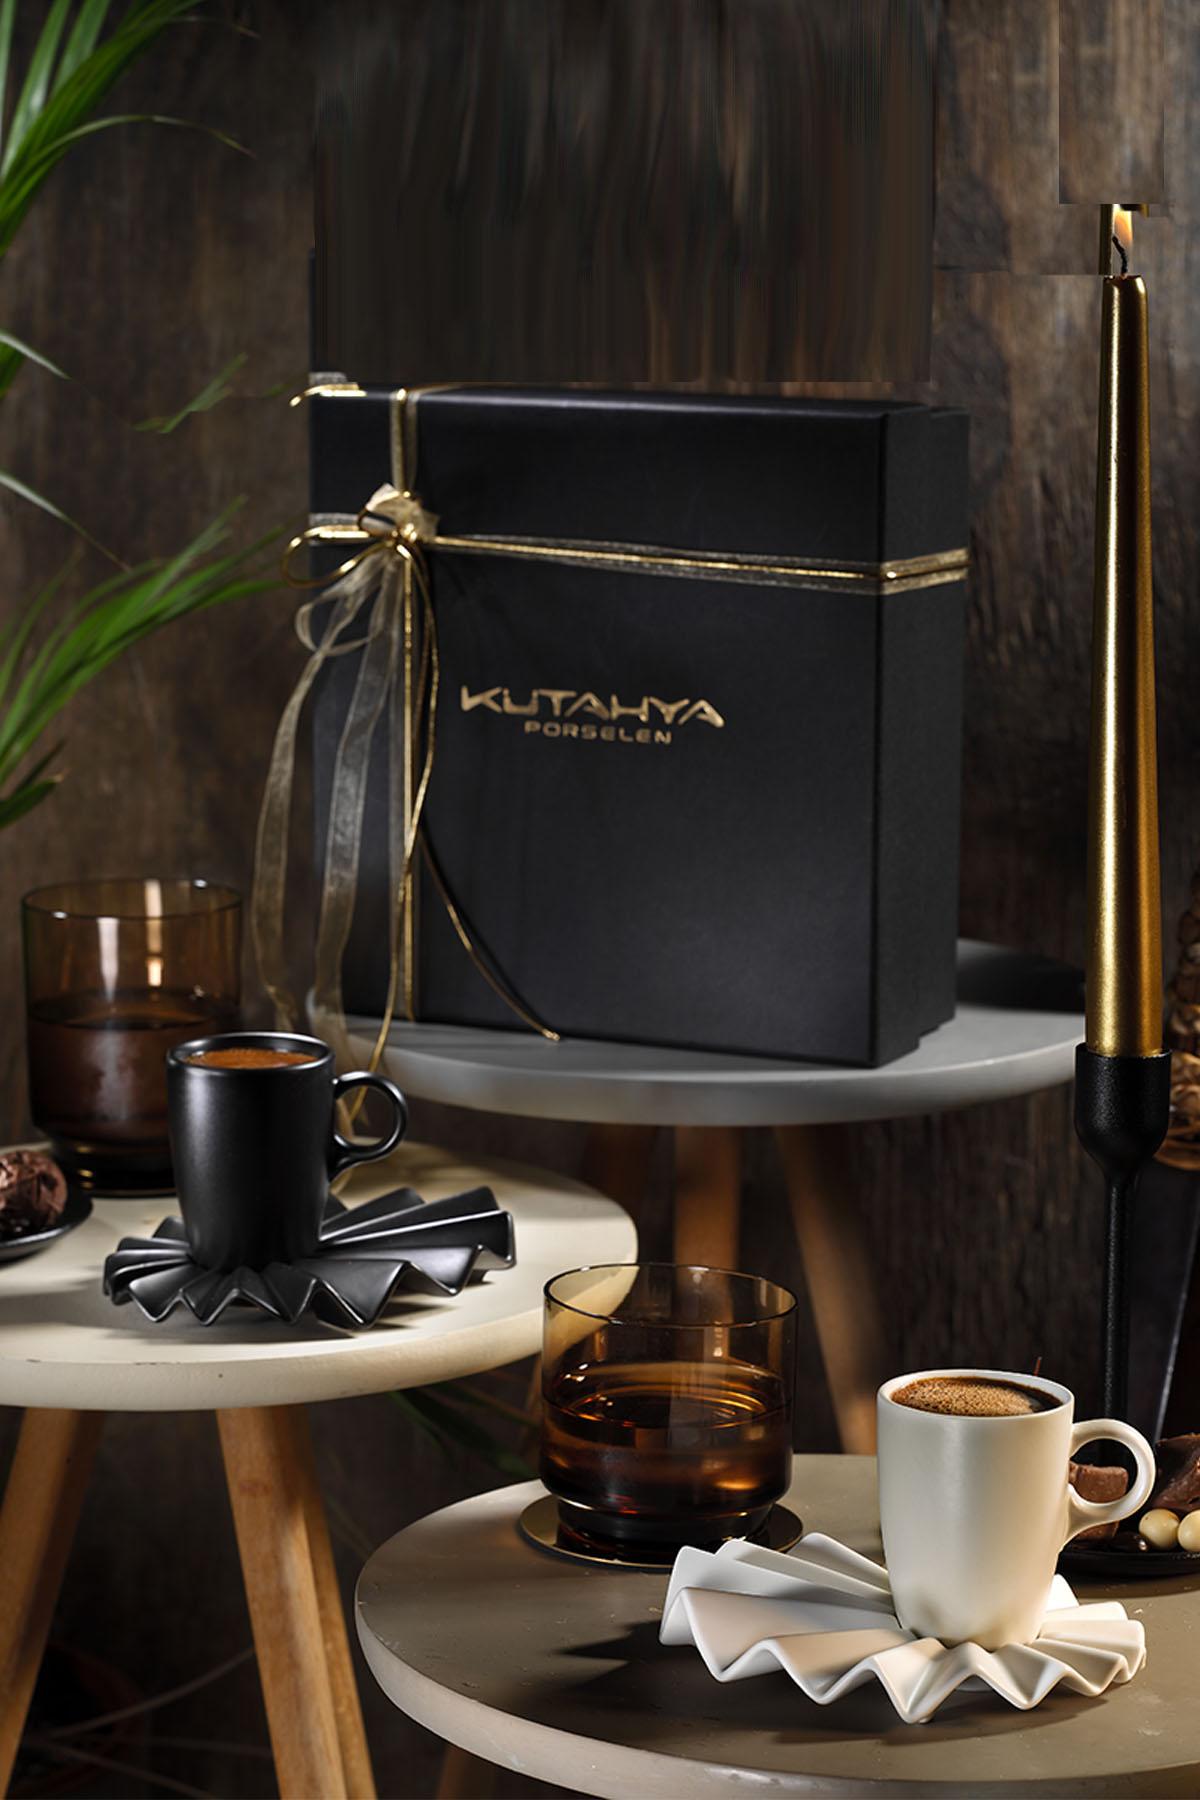 Corendon - Kütahya Porselen Adora Kahve Takımı Siyah & Krem